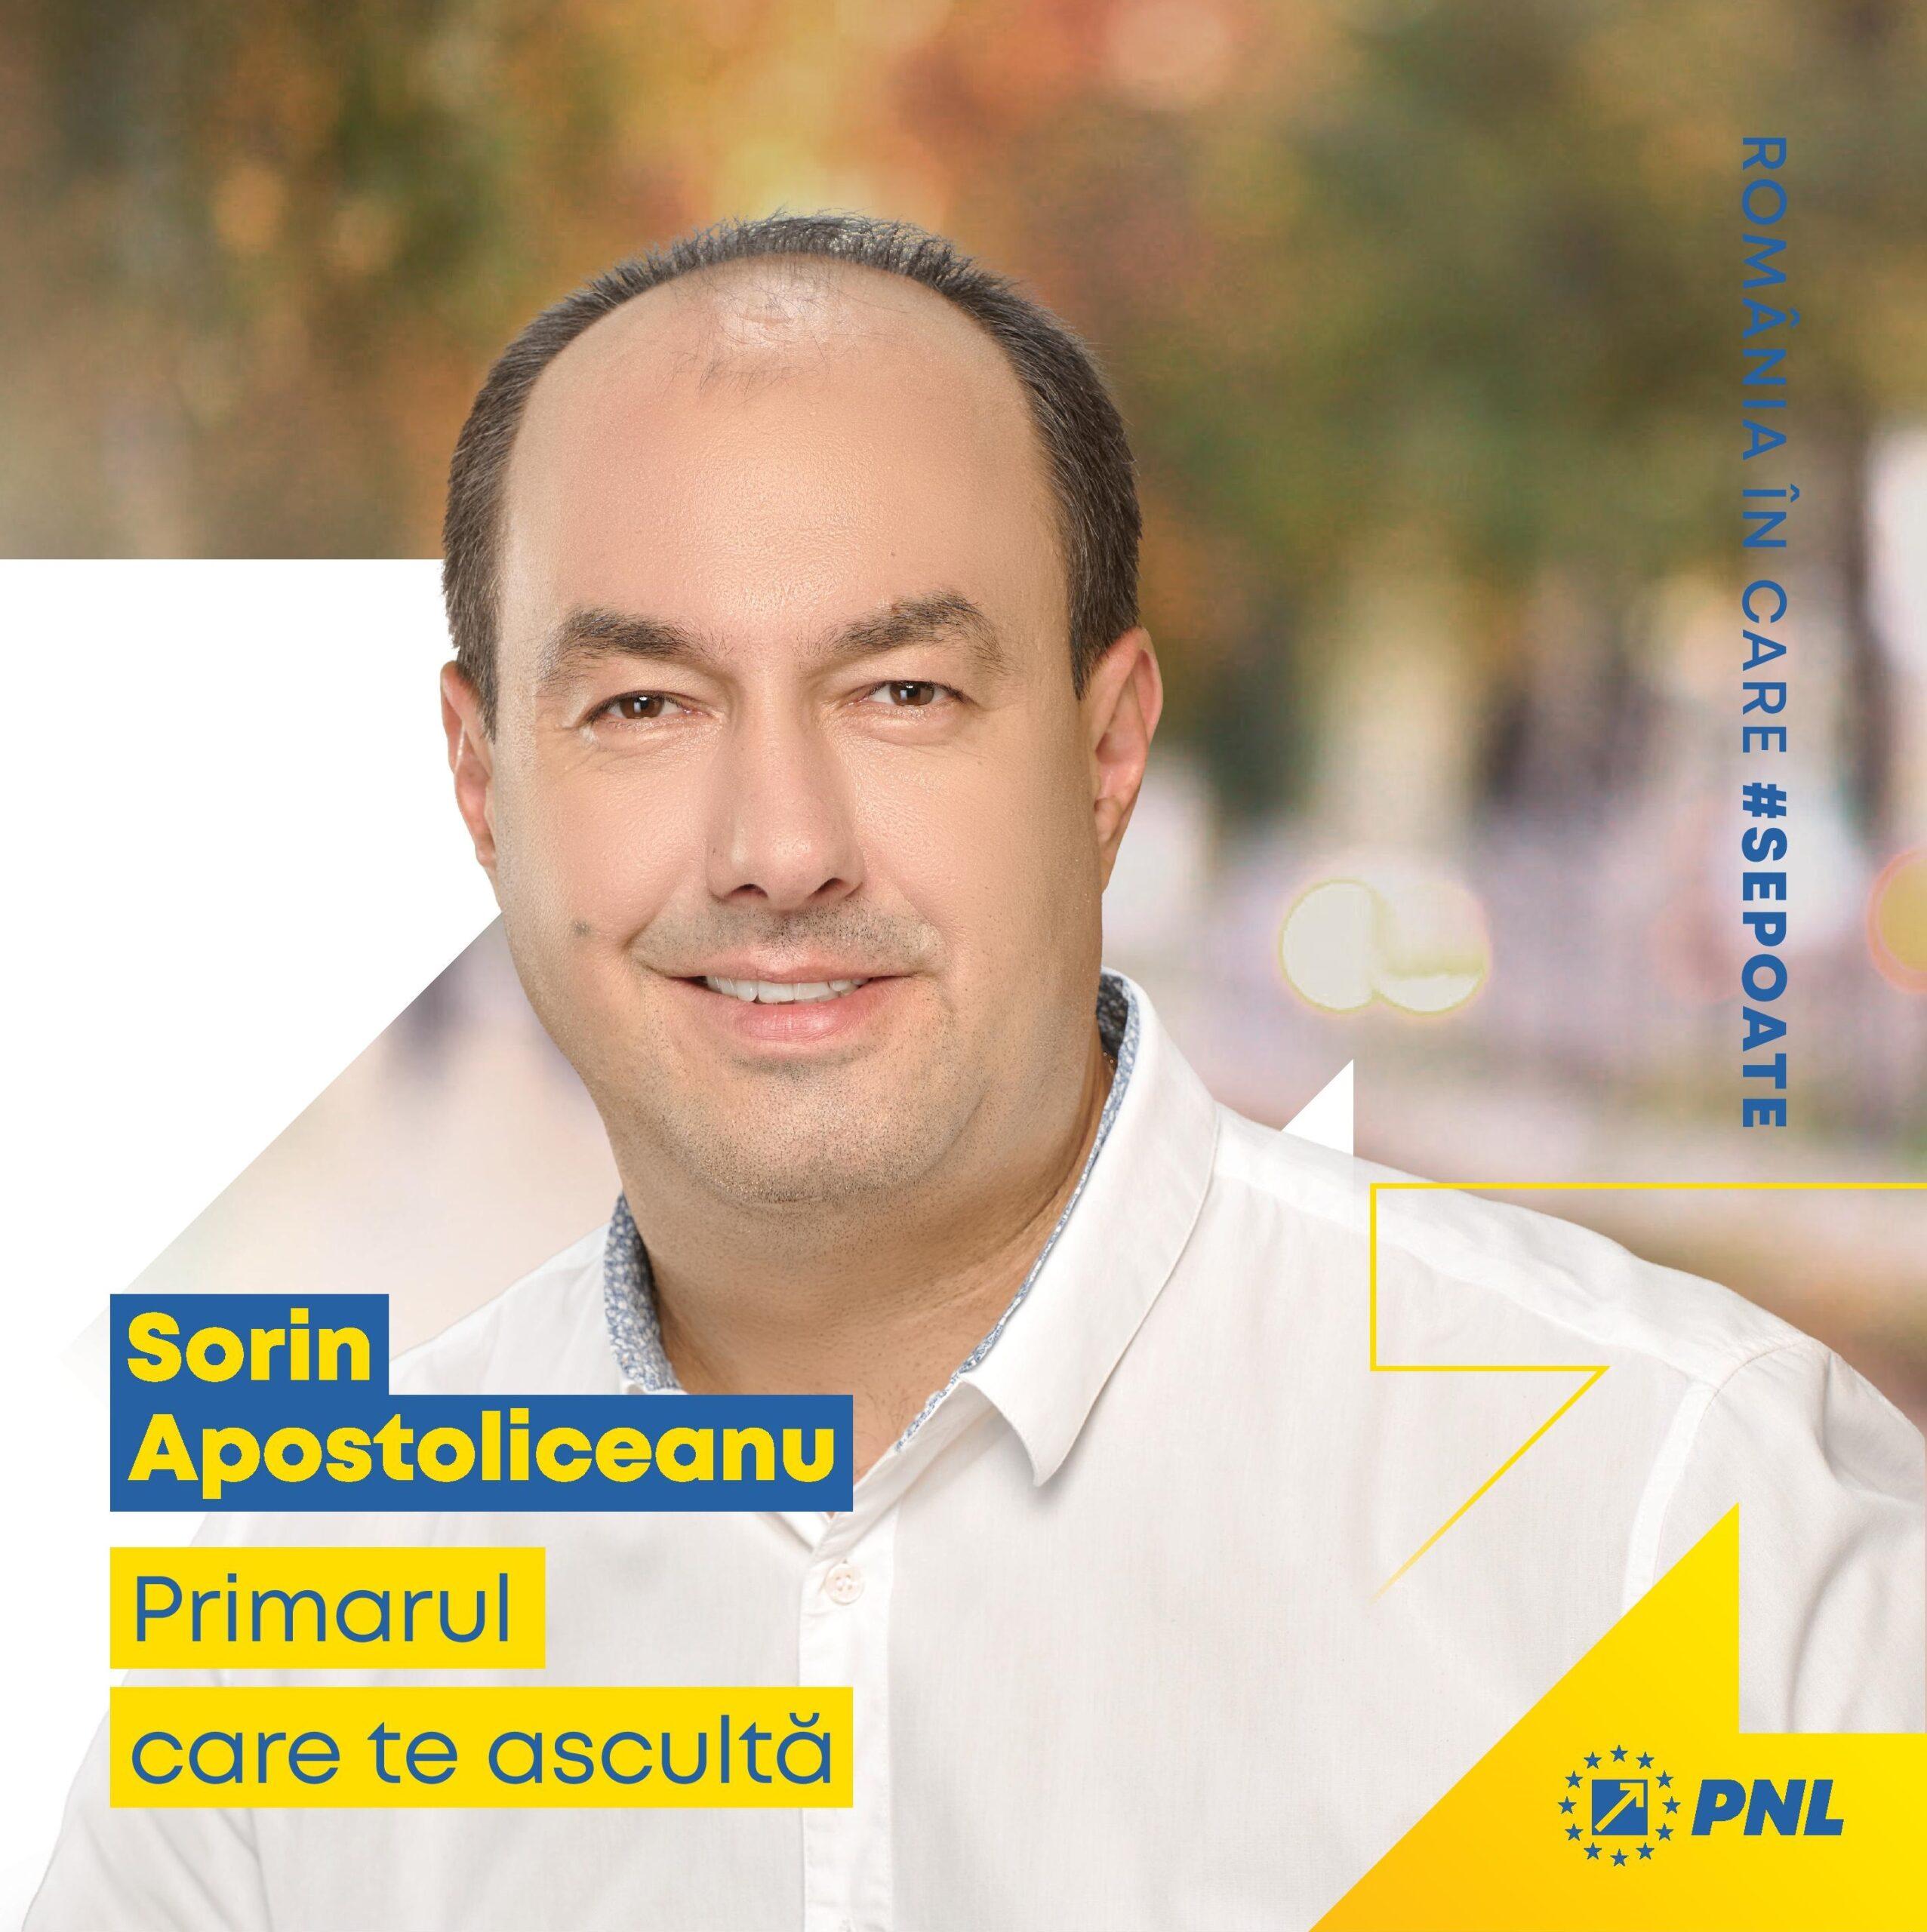 Sorin Apostoliceanu PNL Campanie Electorala